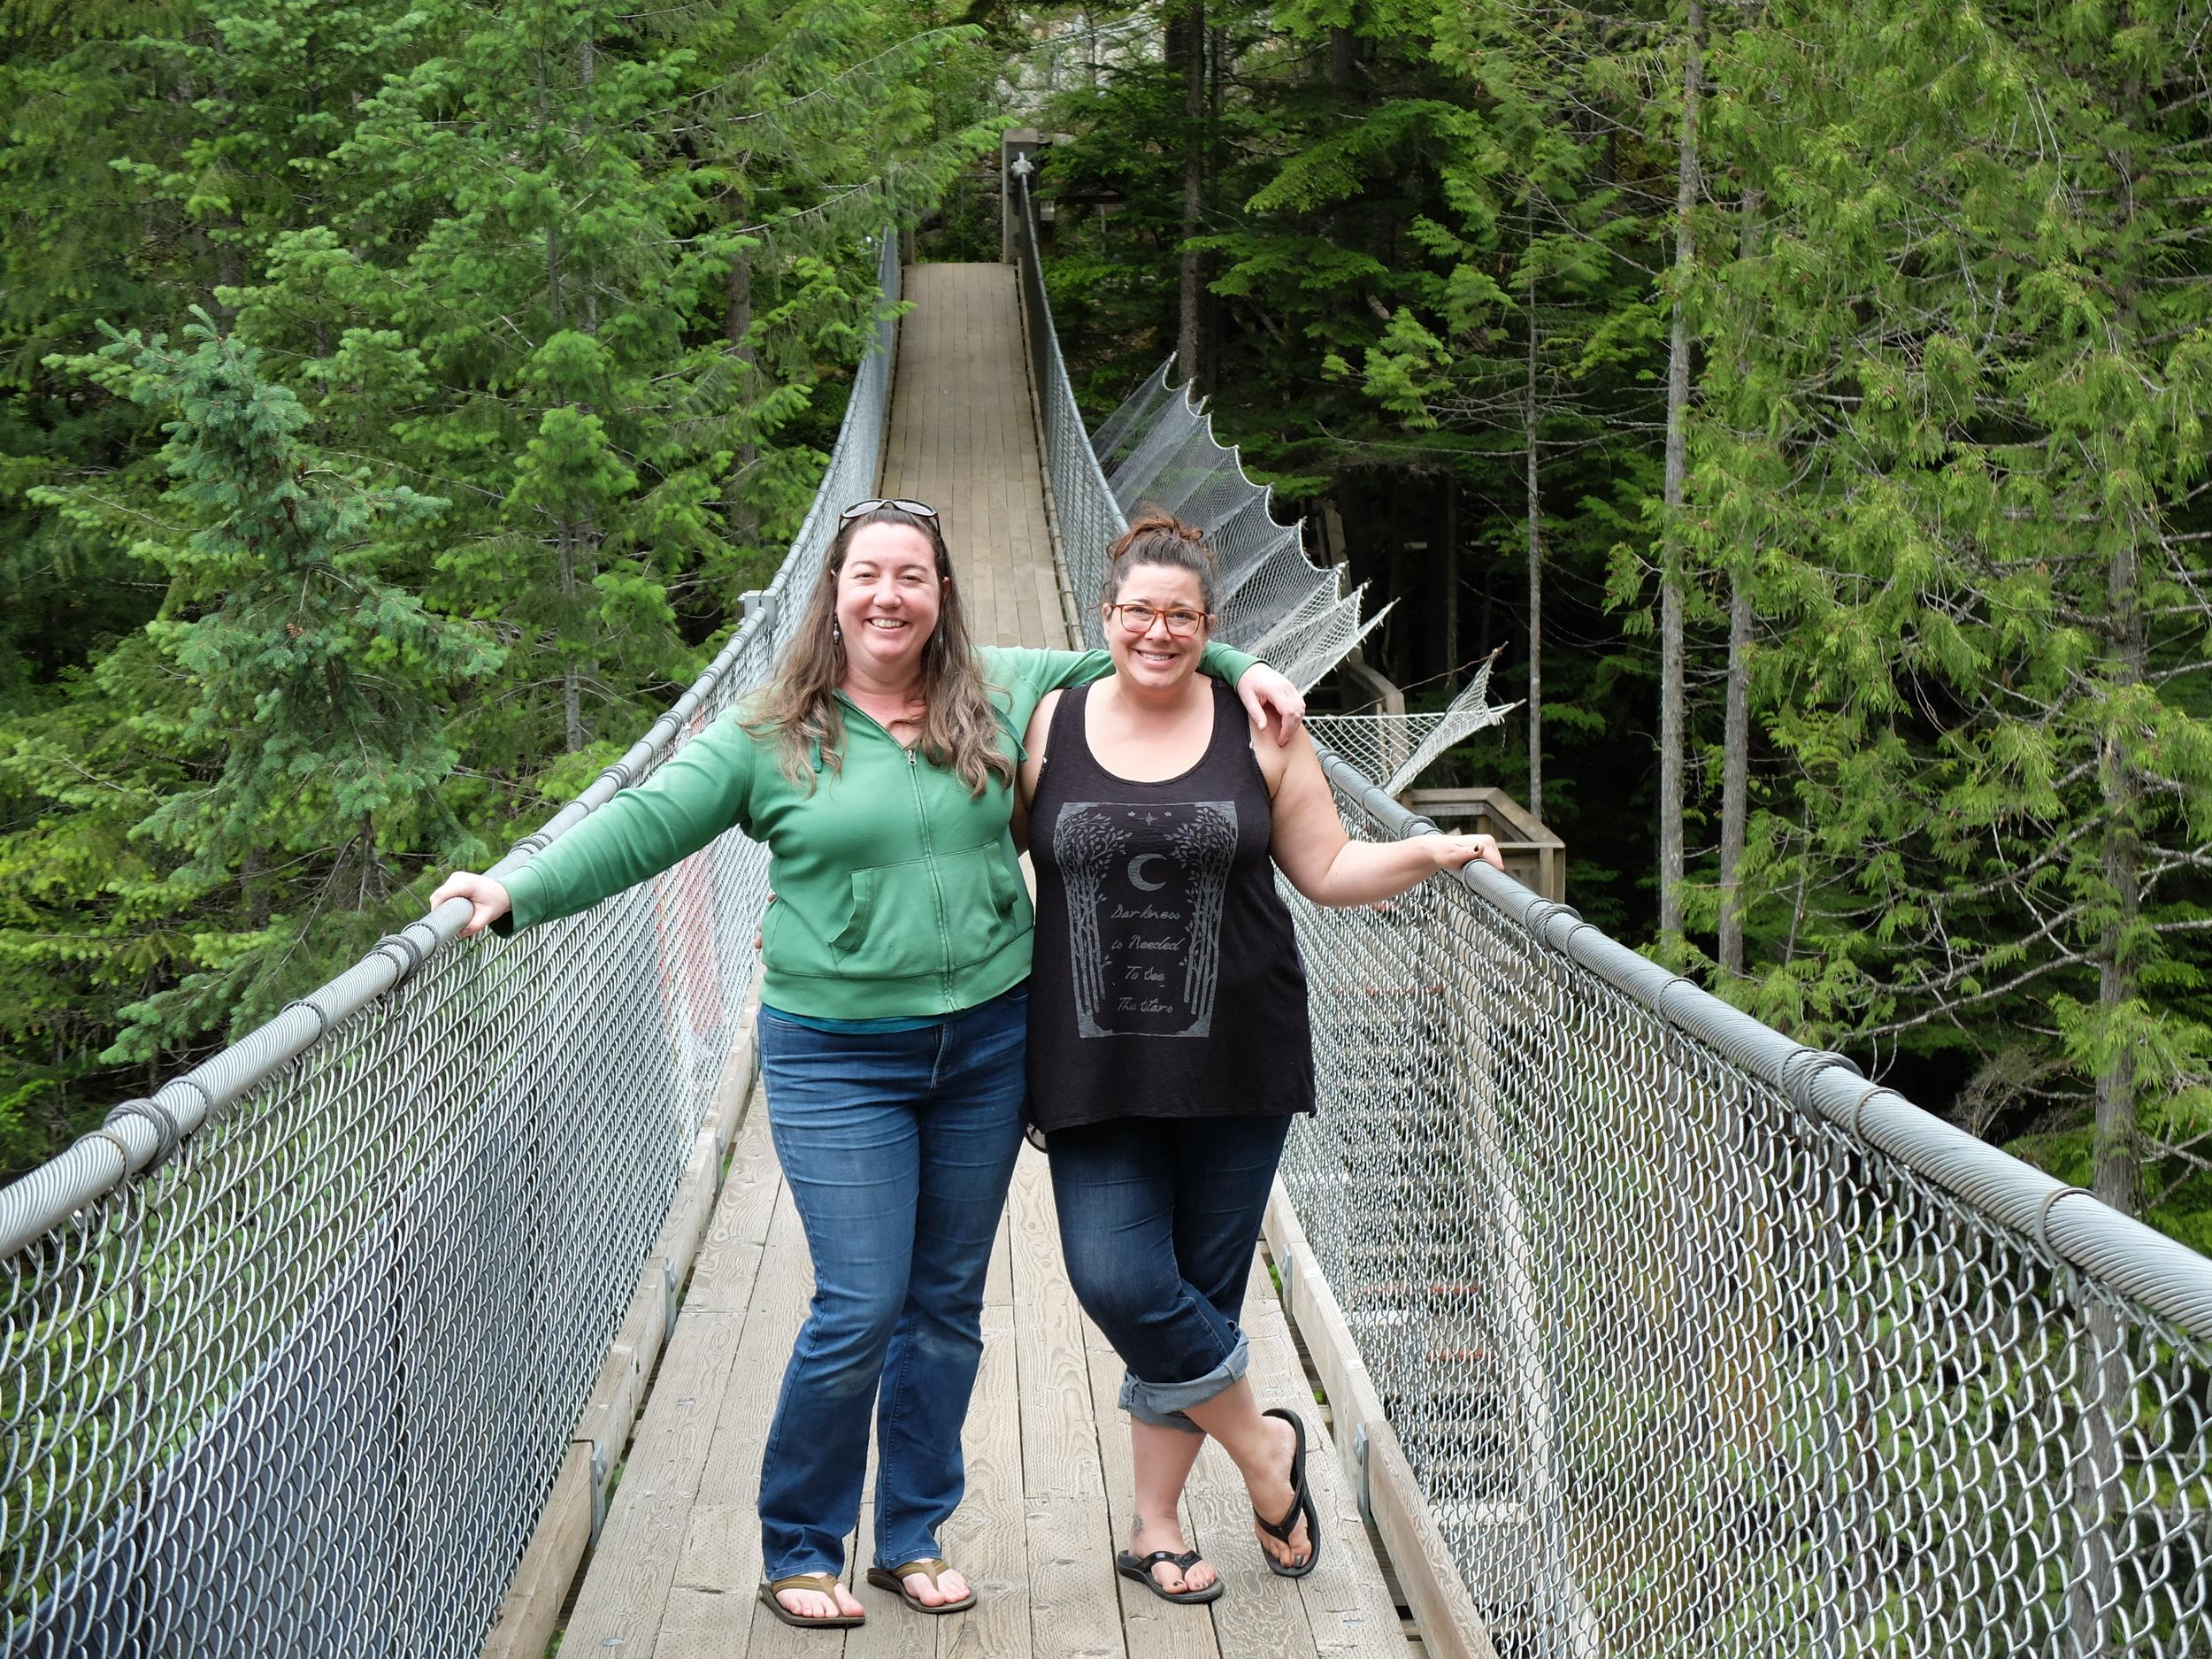 Me and KJ on the suspension bridge